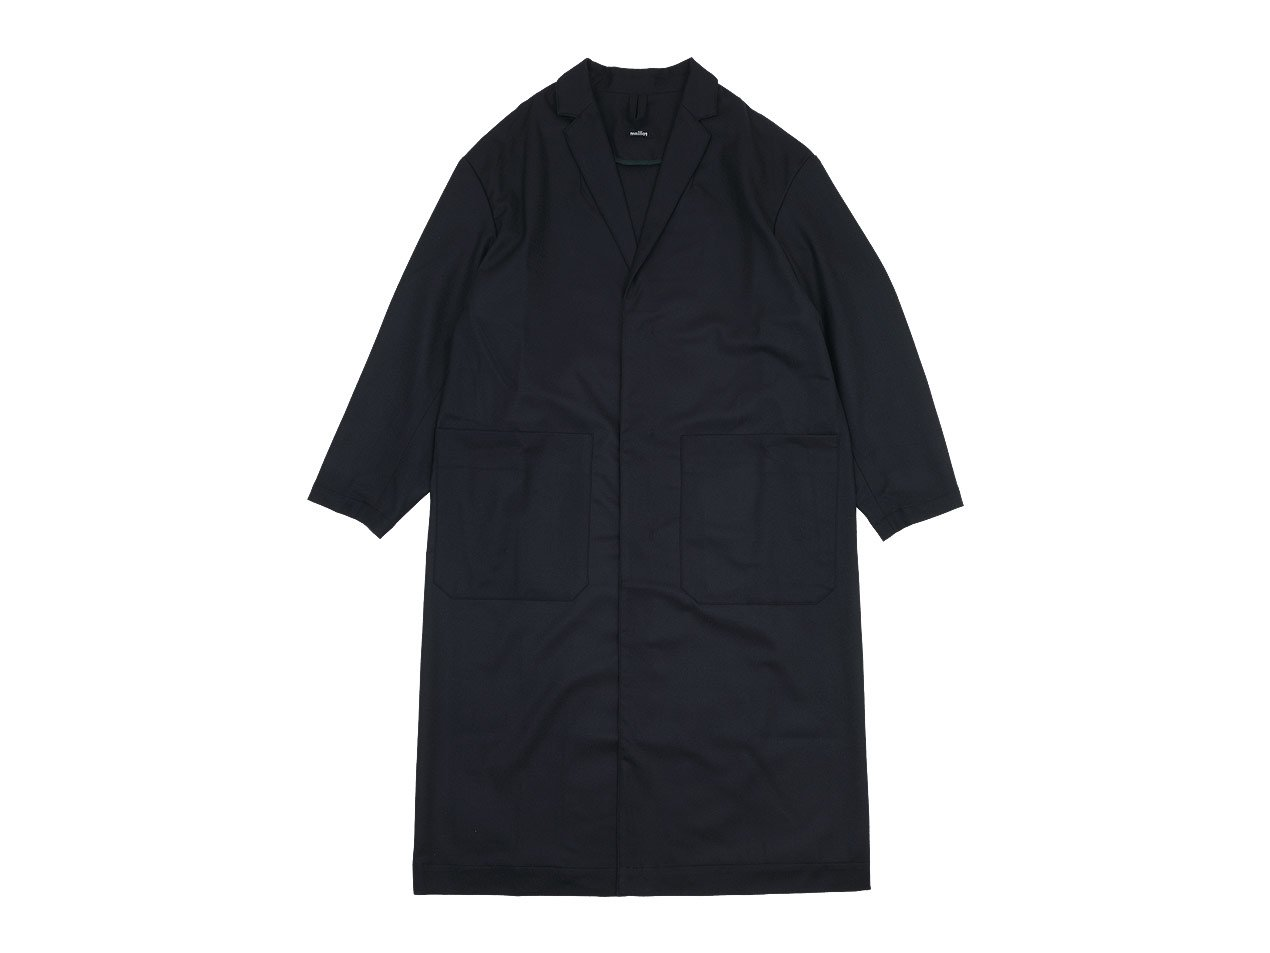 maillot mature wool labo coat NAVY